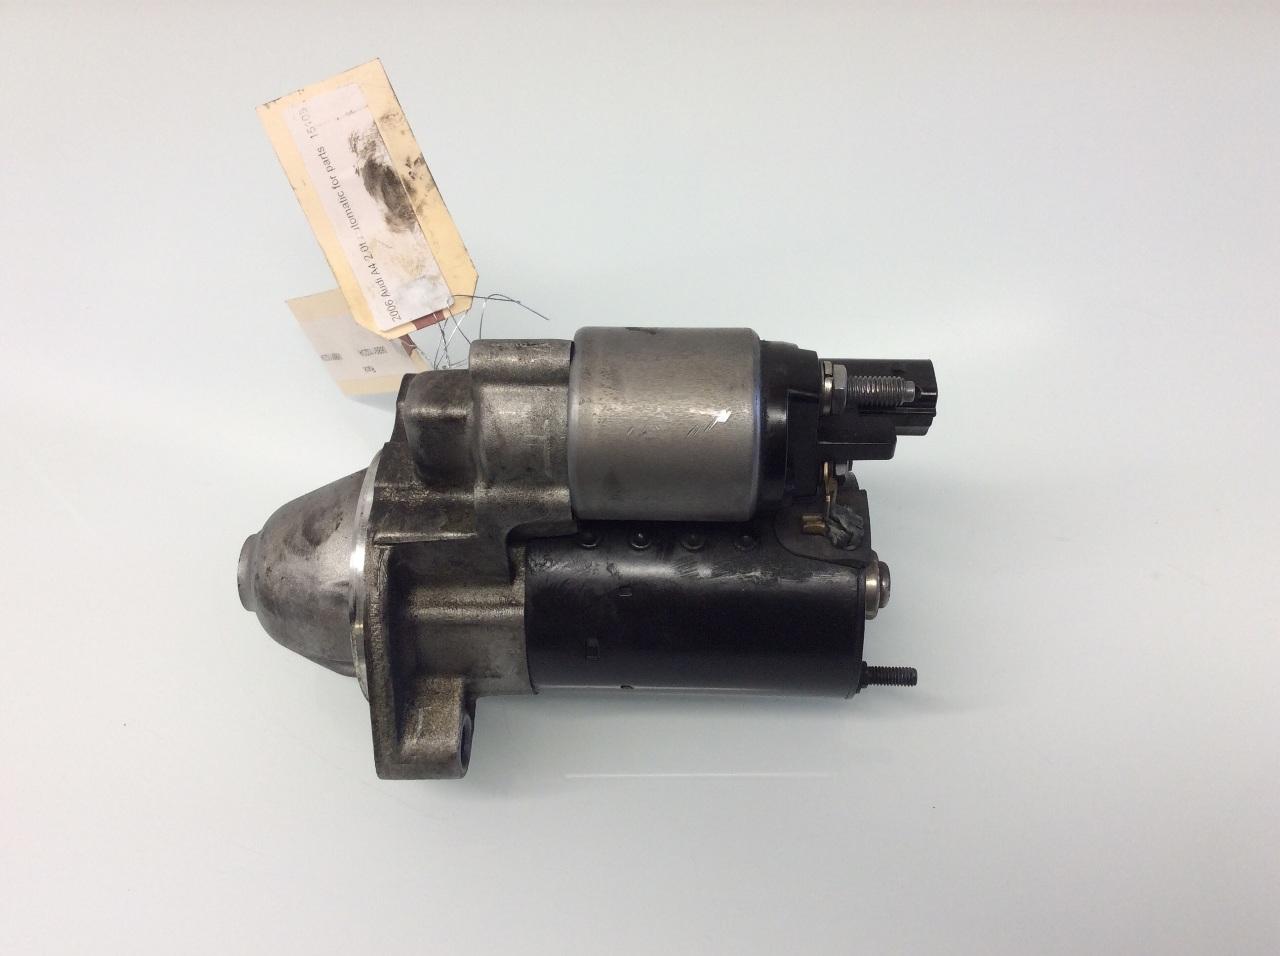 06 07 08 Audi A4 Starter Motor 2 0t 06b911023a Ebay